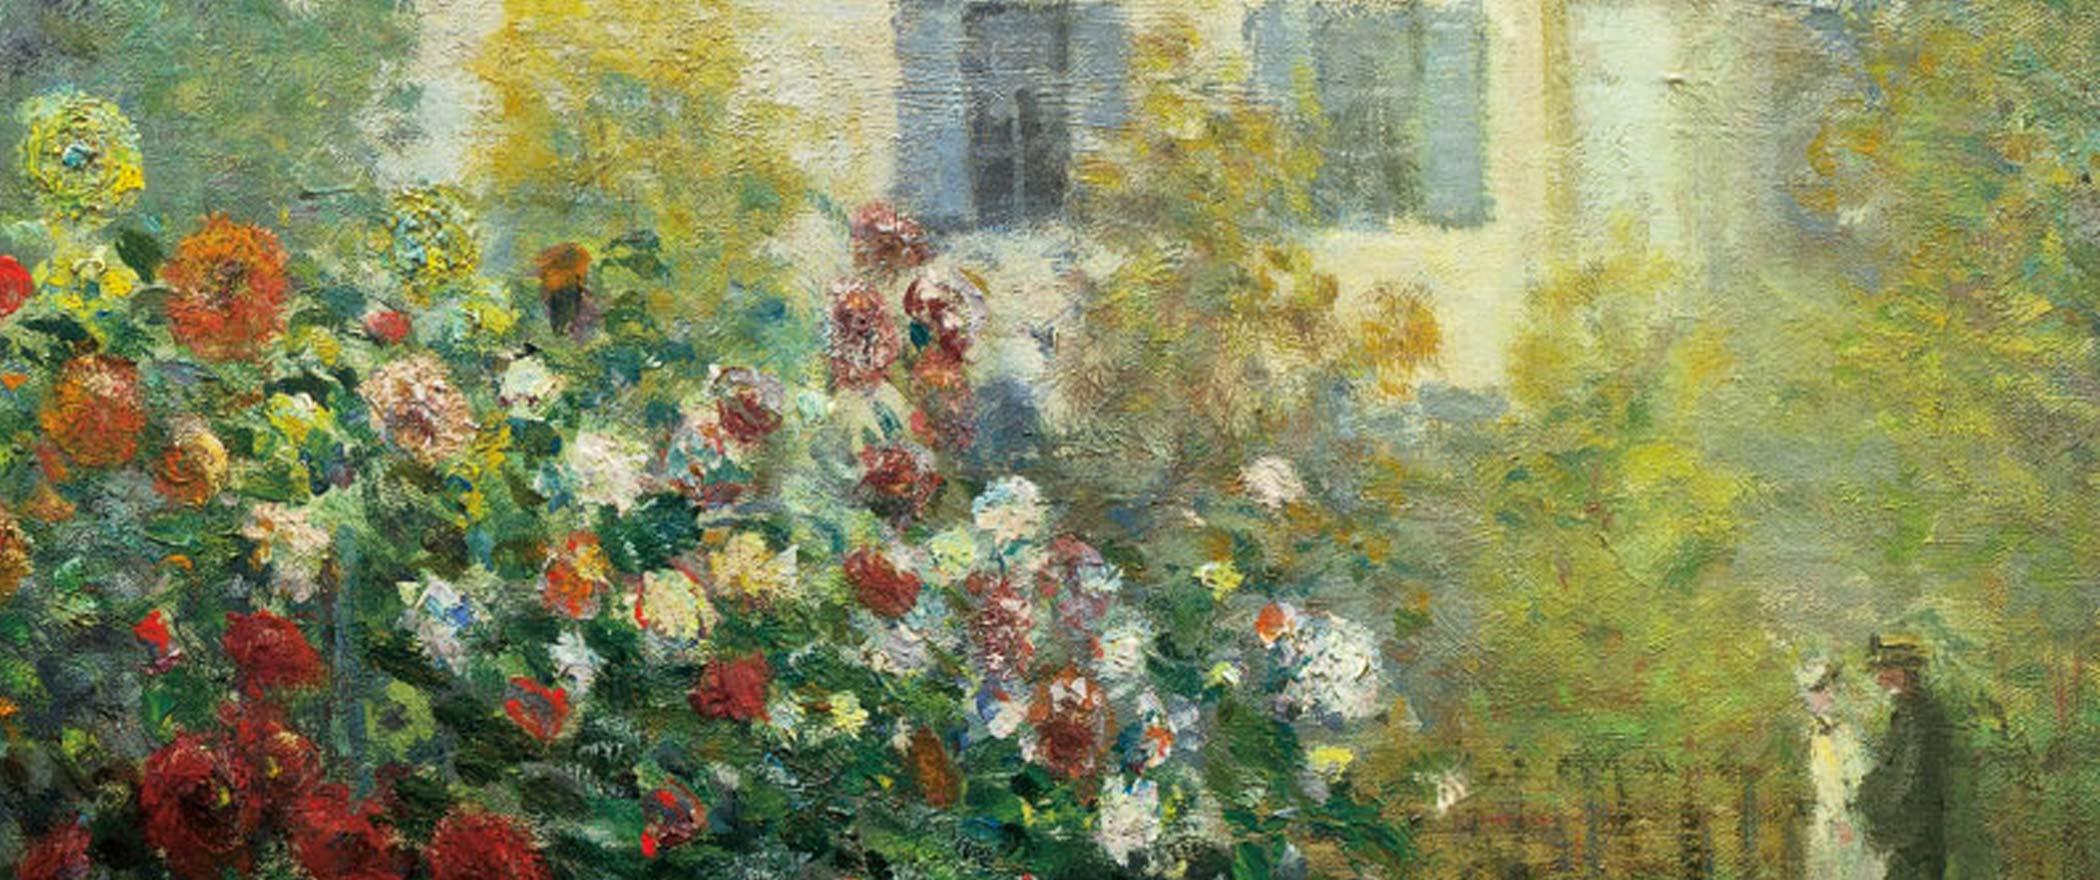 da monet a matisse opere d 39 arte al cinema mam e ForDa Matisse A Monet